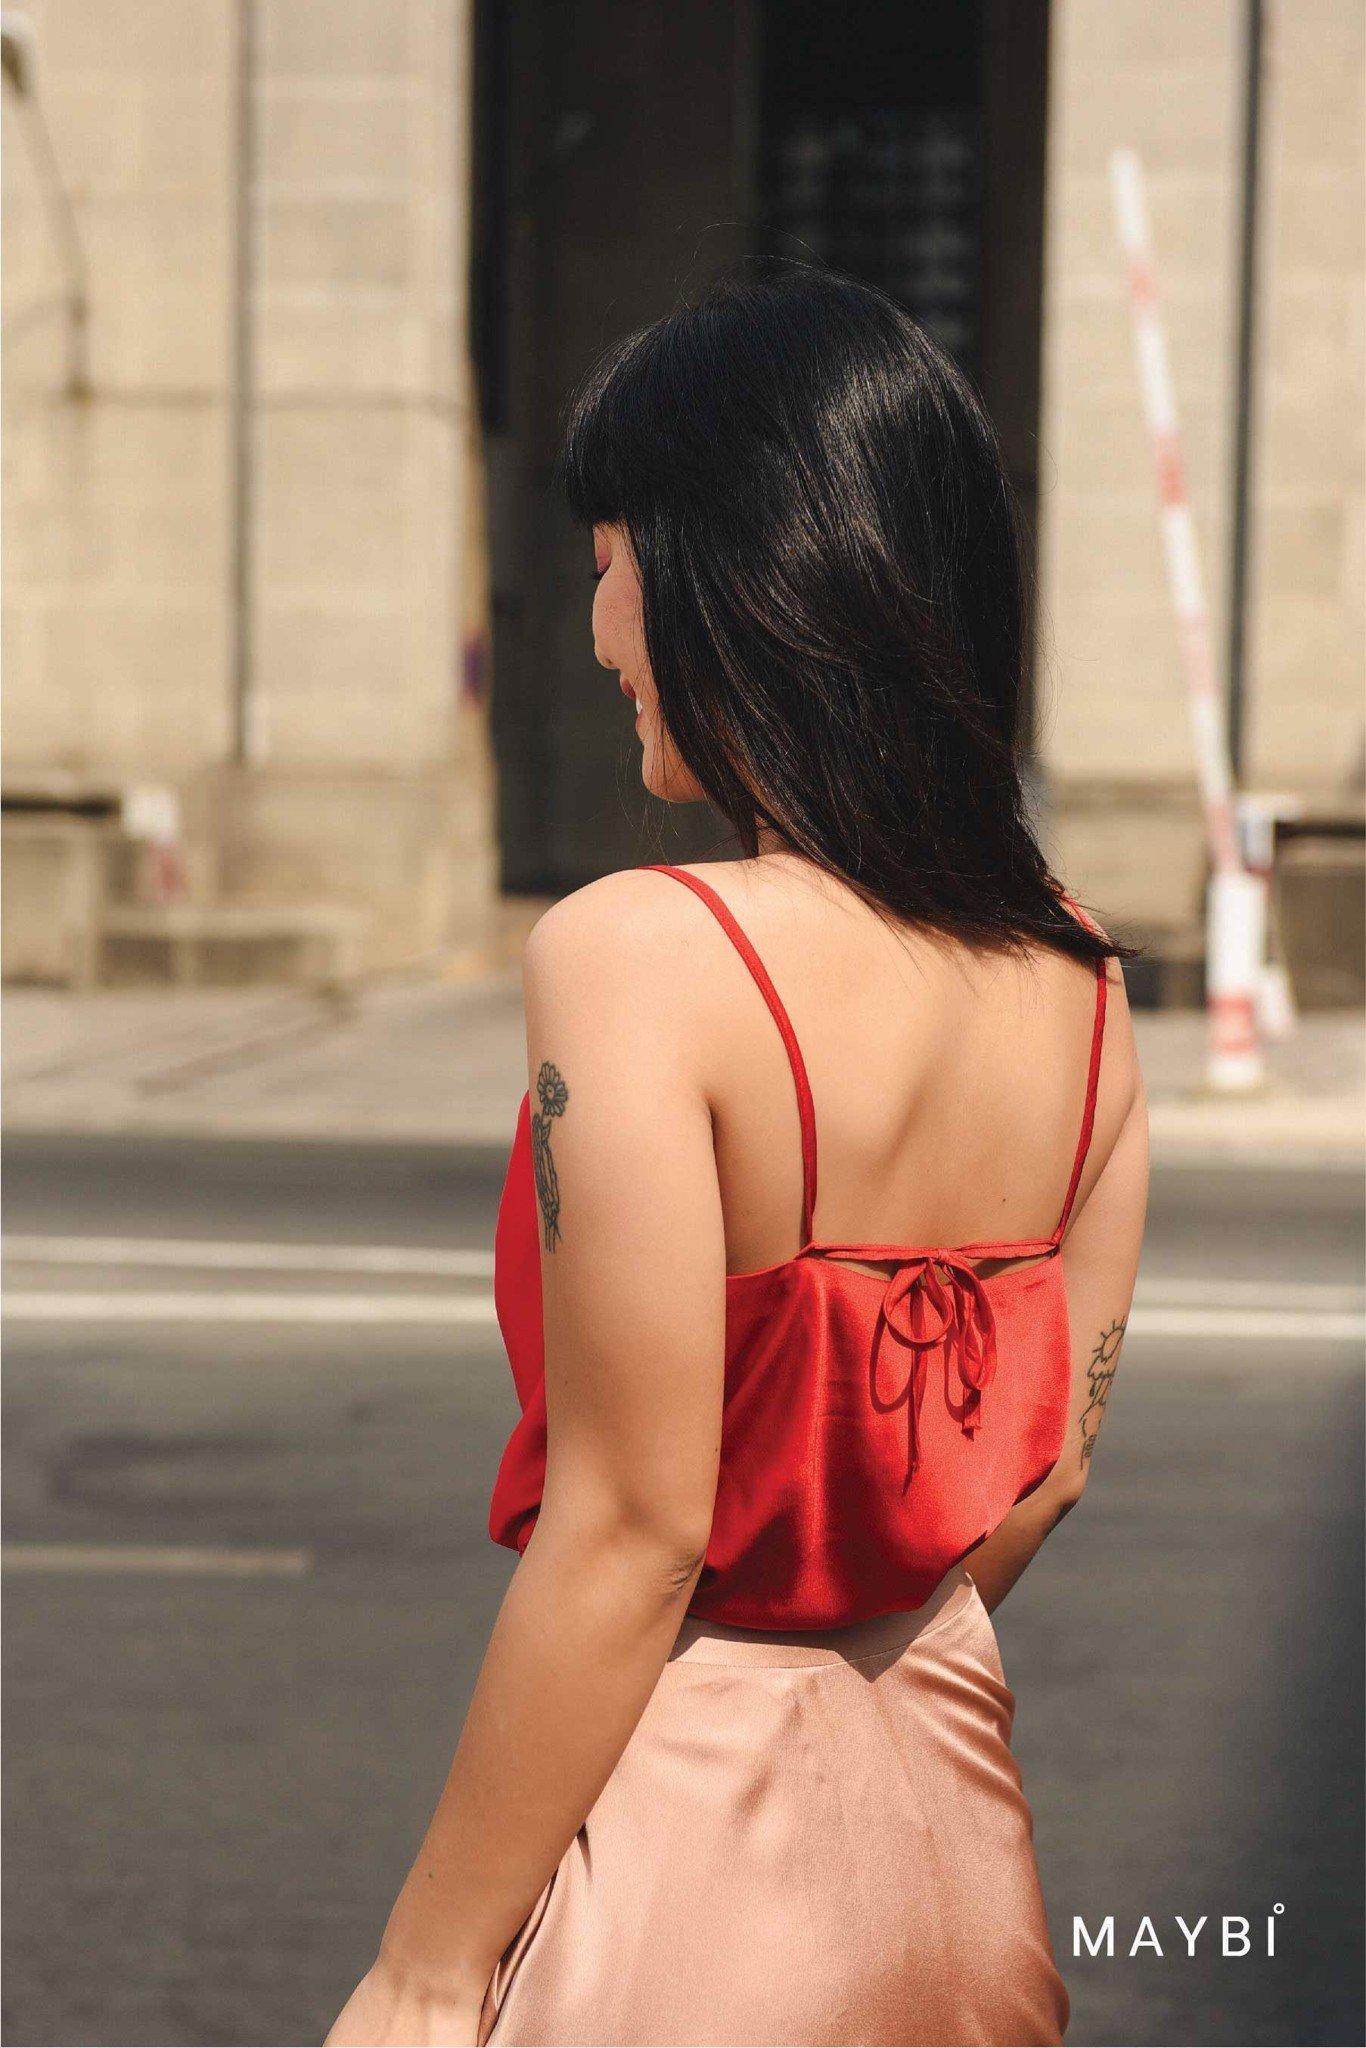 Áo 2 dây đỏ cổ đổ Rowan Red Dress